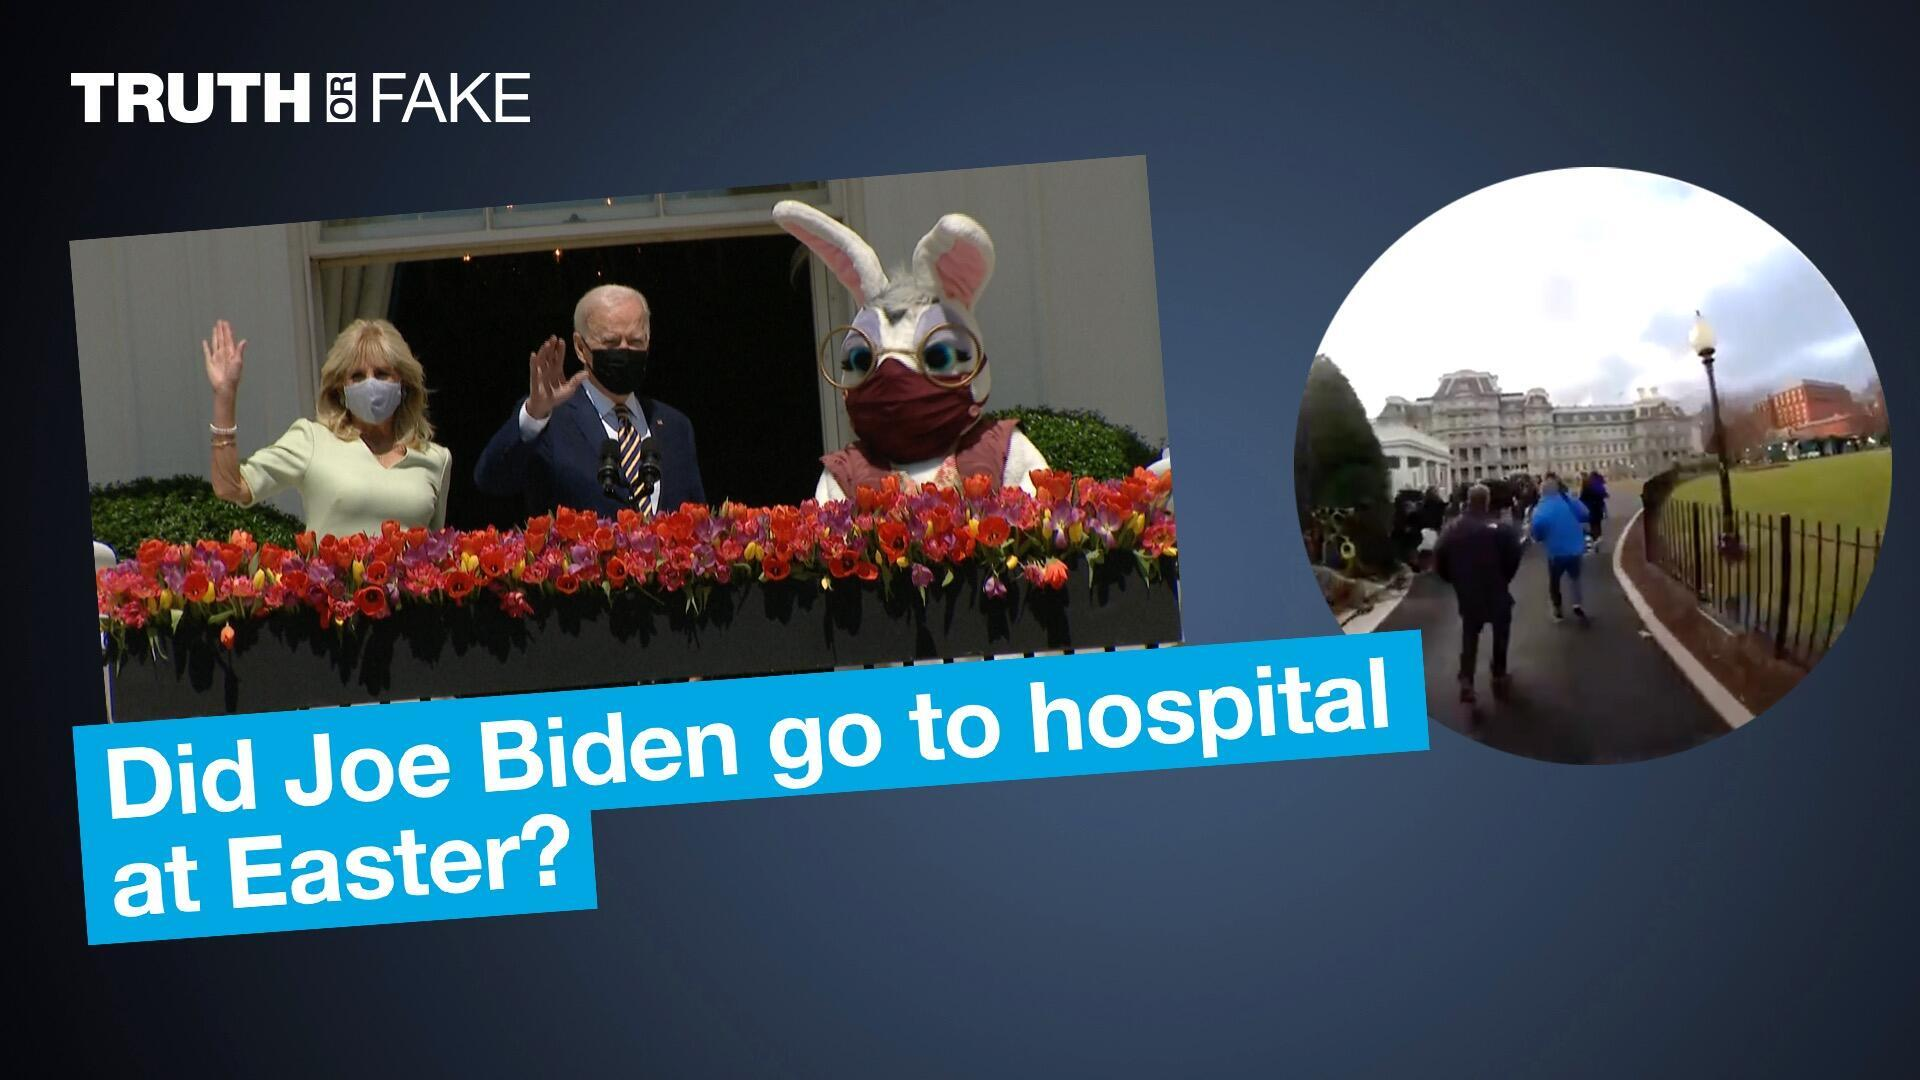 Did Joe Biden go to hospital at Easter?